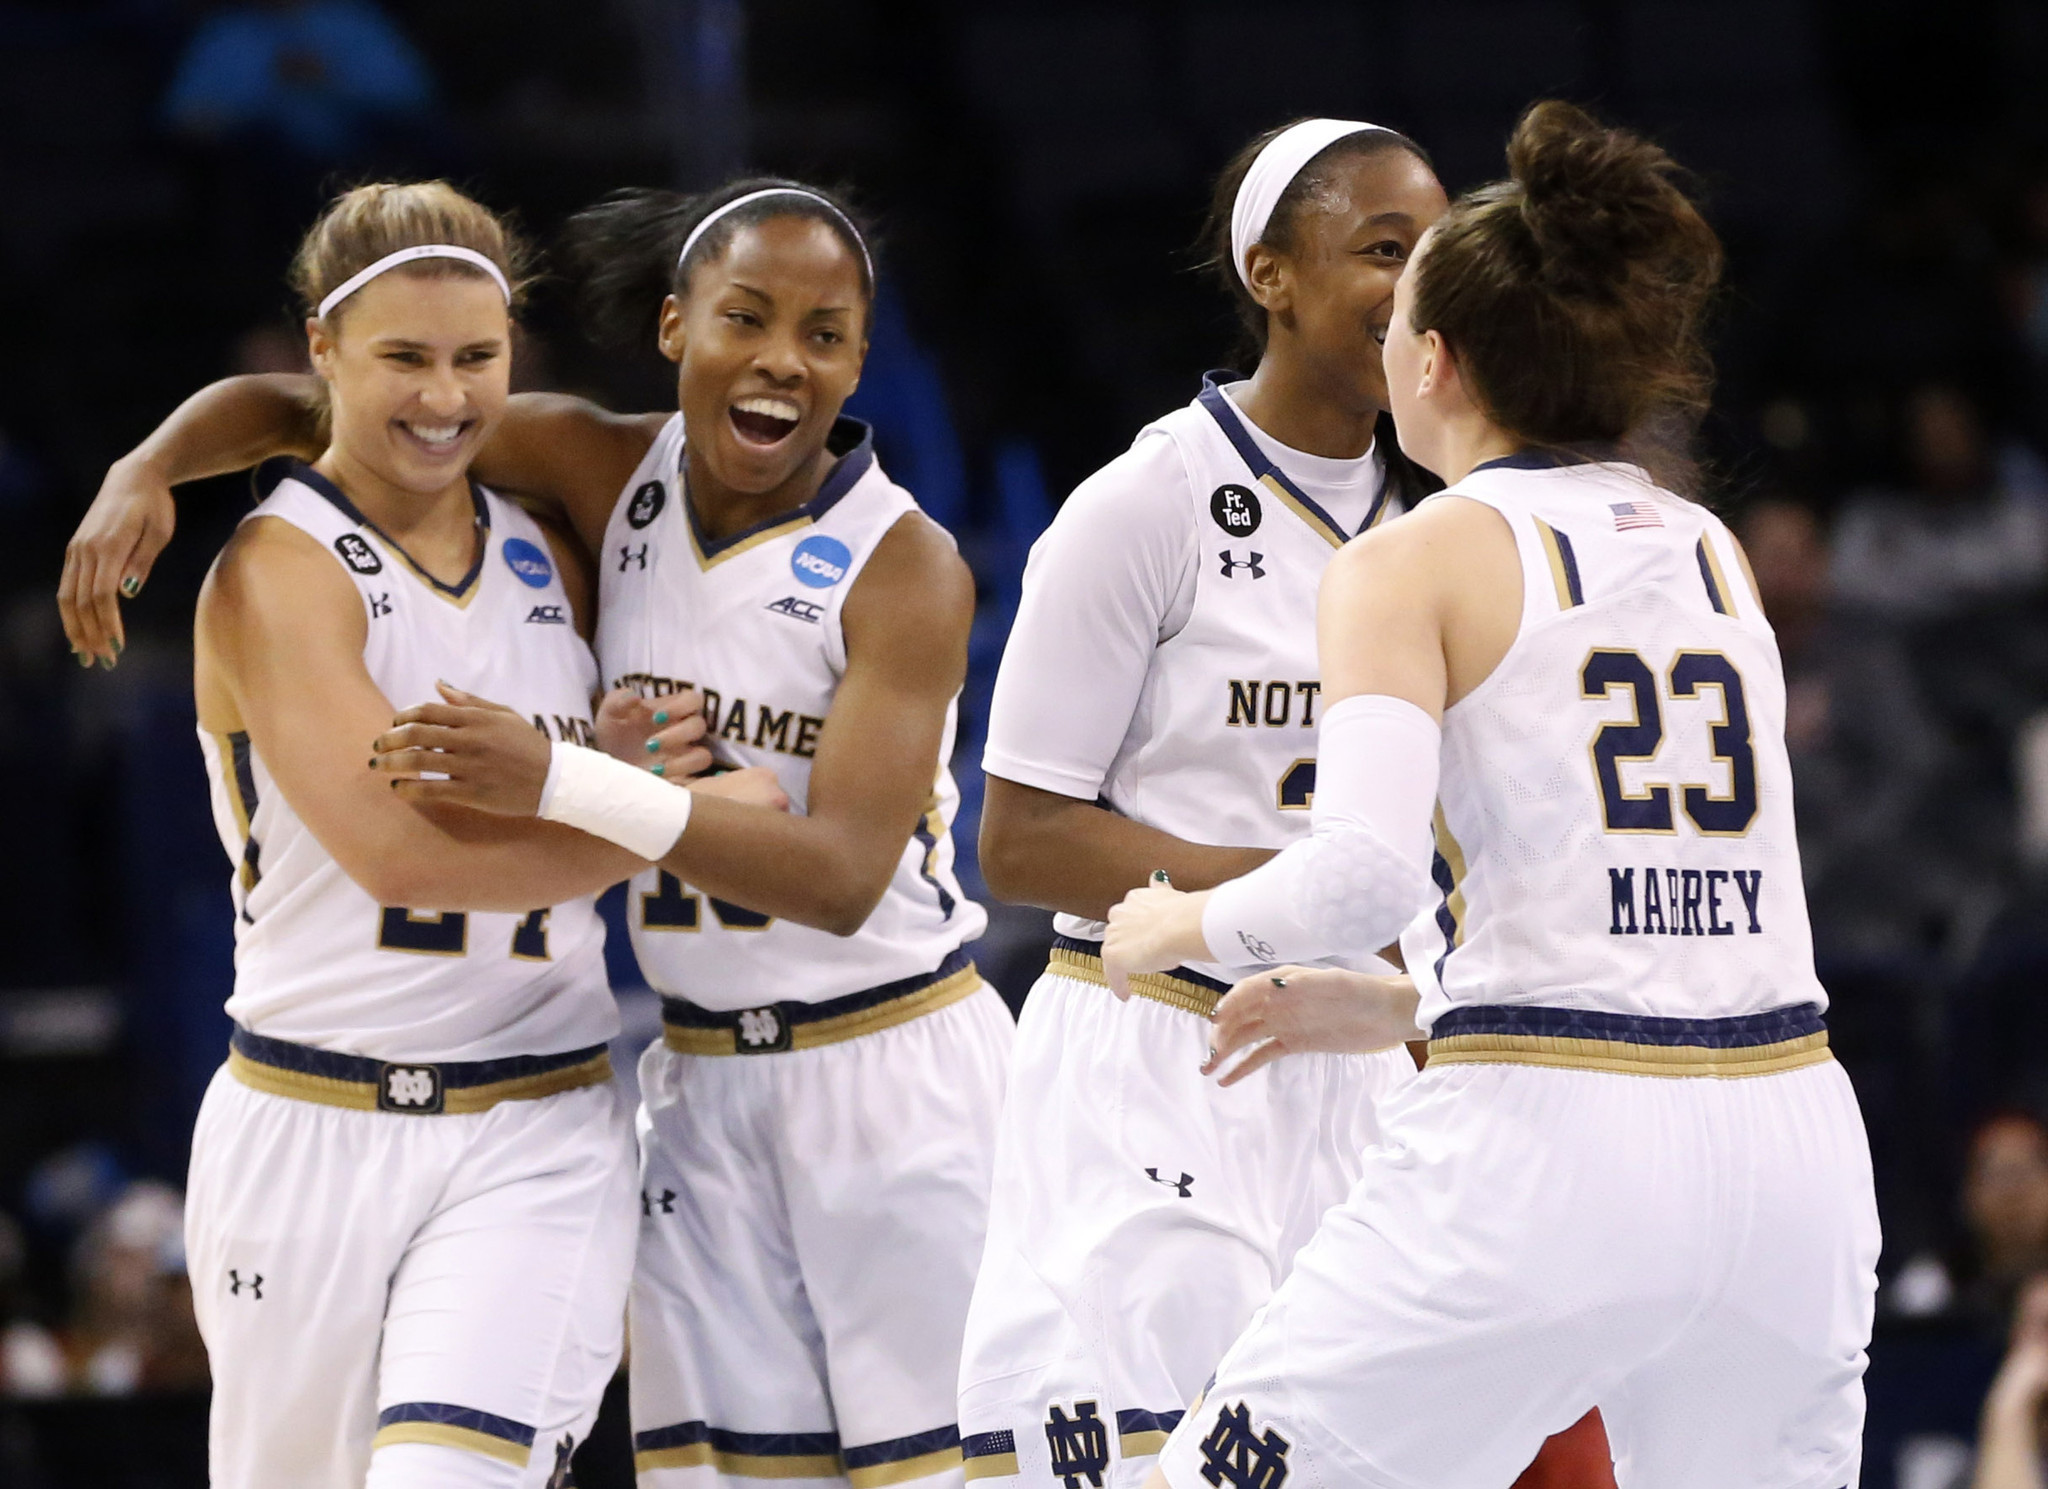 Notre Dame women finally beat Stanford, head to NCAA Elite 8